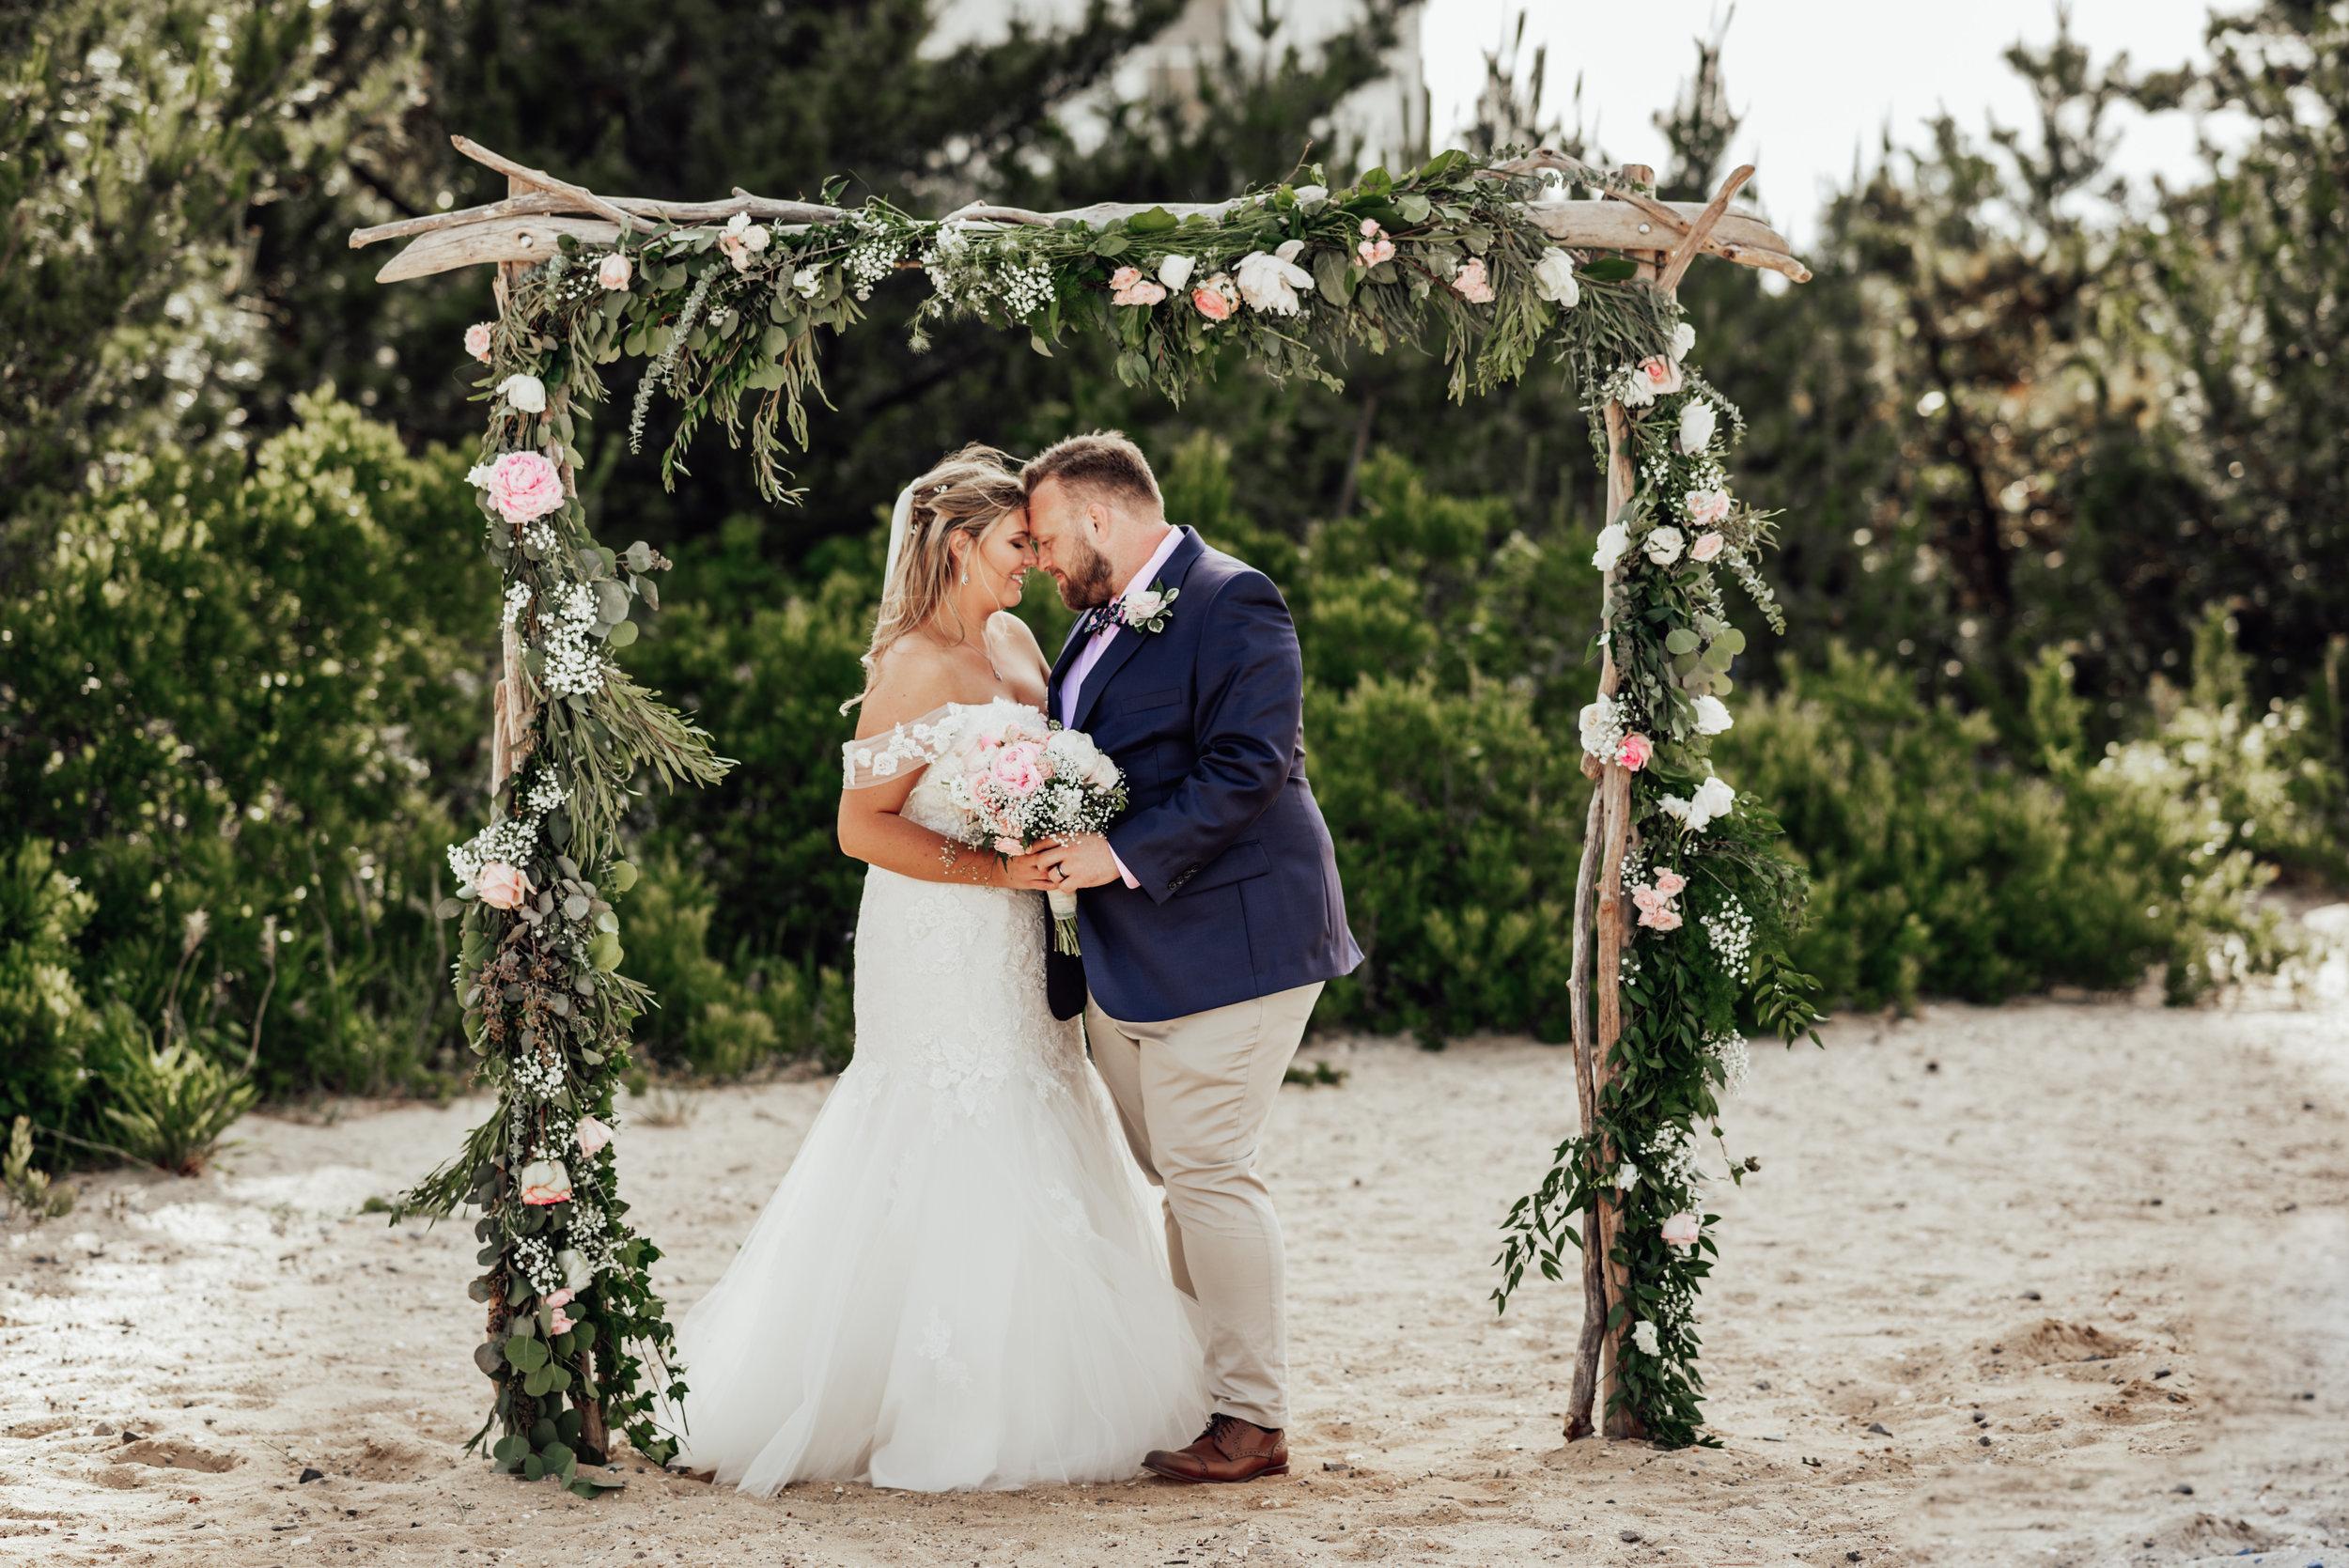 New Jersey Wedding Photographer, Felsberg Photography LBI wedding photography 82.jpg